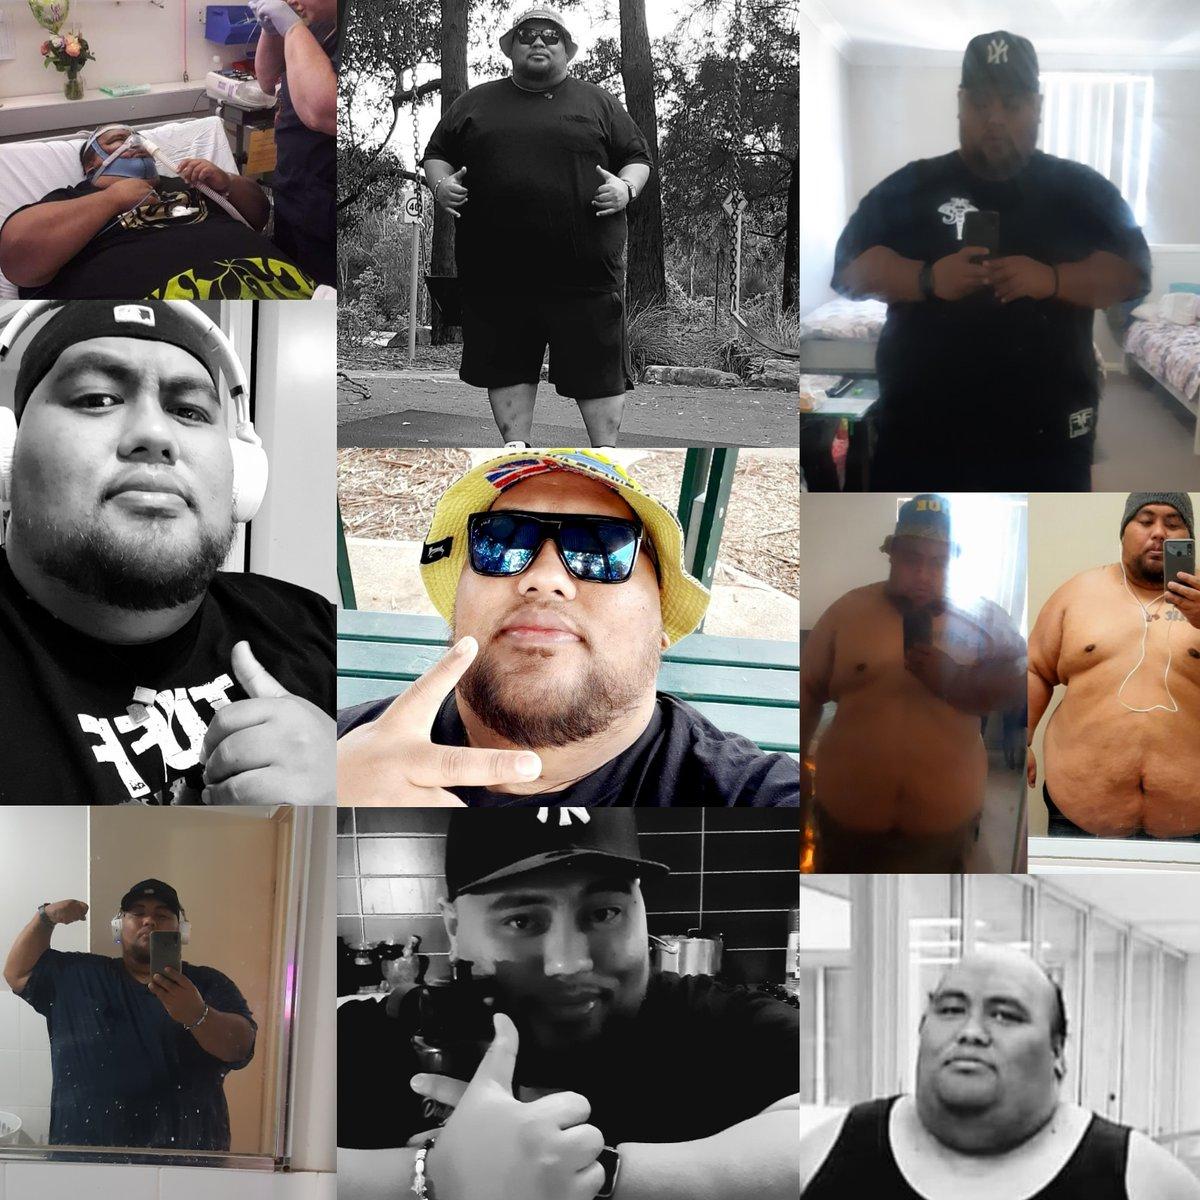 transformation| changes| obese obese2beast| optifast| vlcd| feed your focus| 12 week intensive #myweightlossjourney #weightloss #myoptifastjourney #optifastvlcdiet #optifastau #optifast800 #feedyourfocus #changeisgood #niueanladlivingabroad  @OPTIFAST @Optifast_VLCD @Nestlepic.twitter.com/HUaSBIVtt5